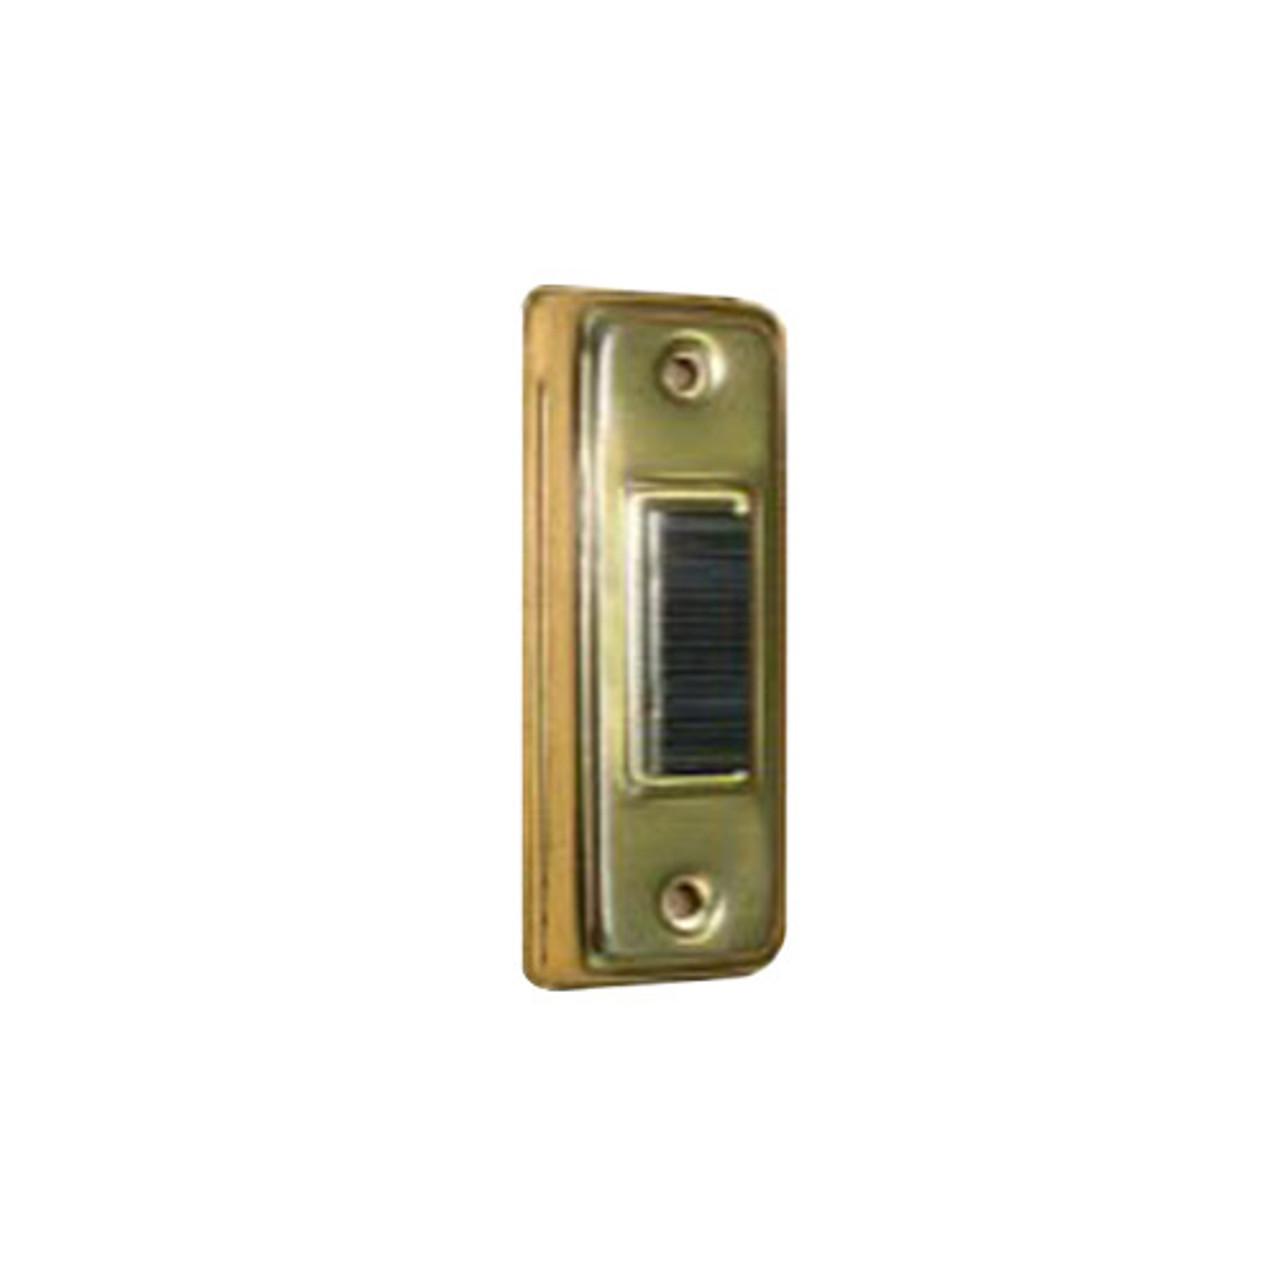 71G Trine Push Button Anodized Brass Aluminum Housing with Black Bar